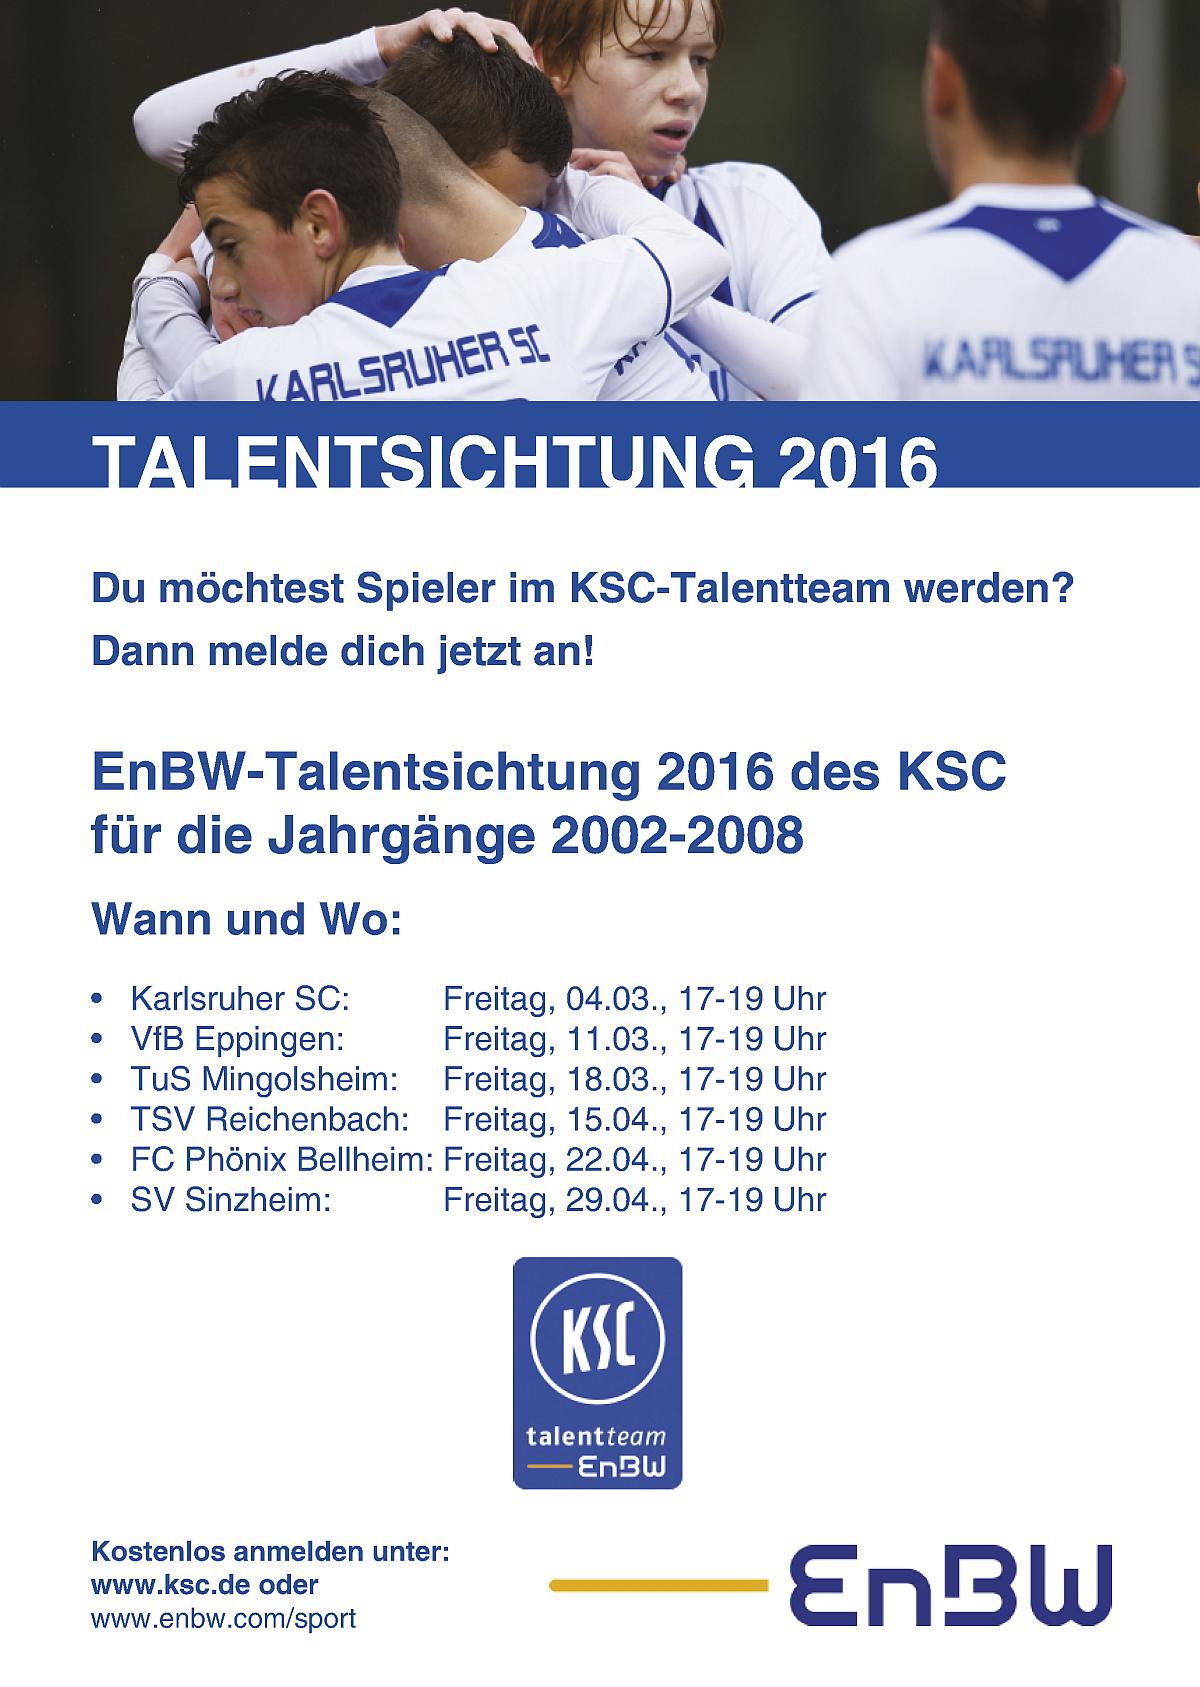 2016 EnBW Talentsichtung